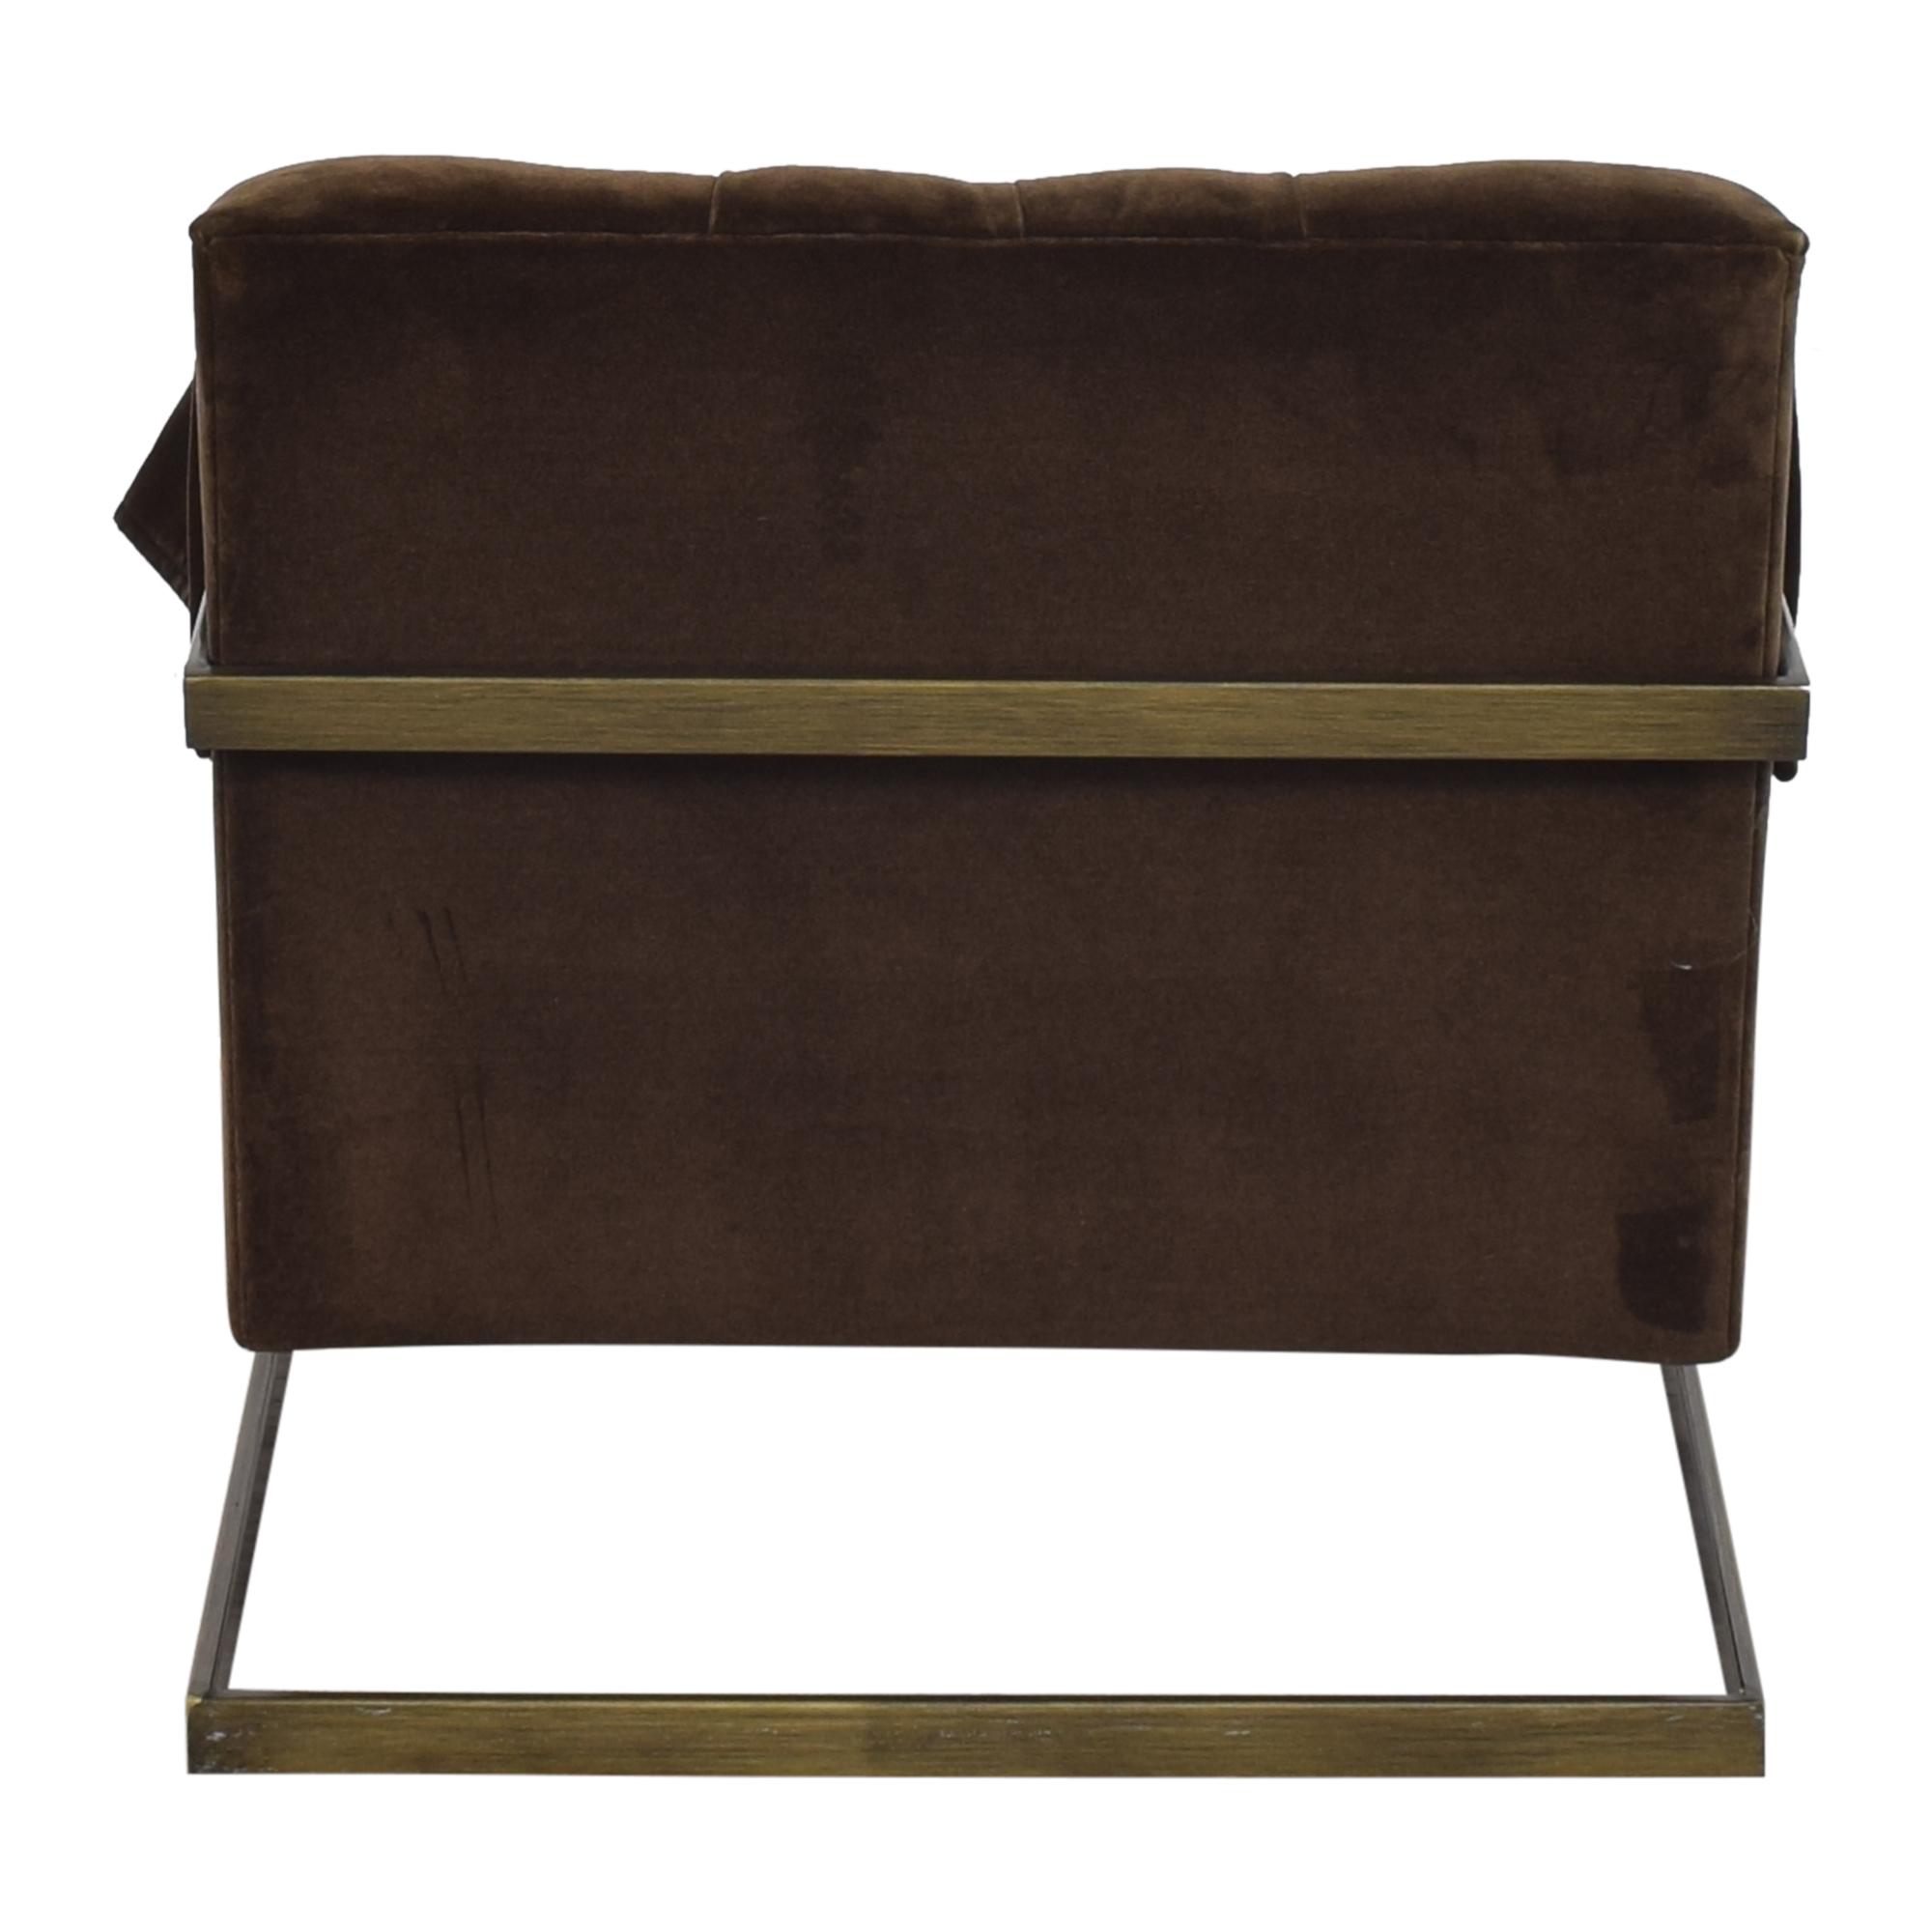 Safavieh Tufted Accent Chair Safavieh